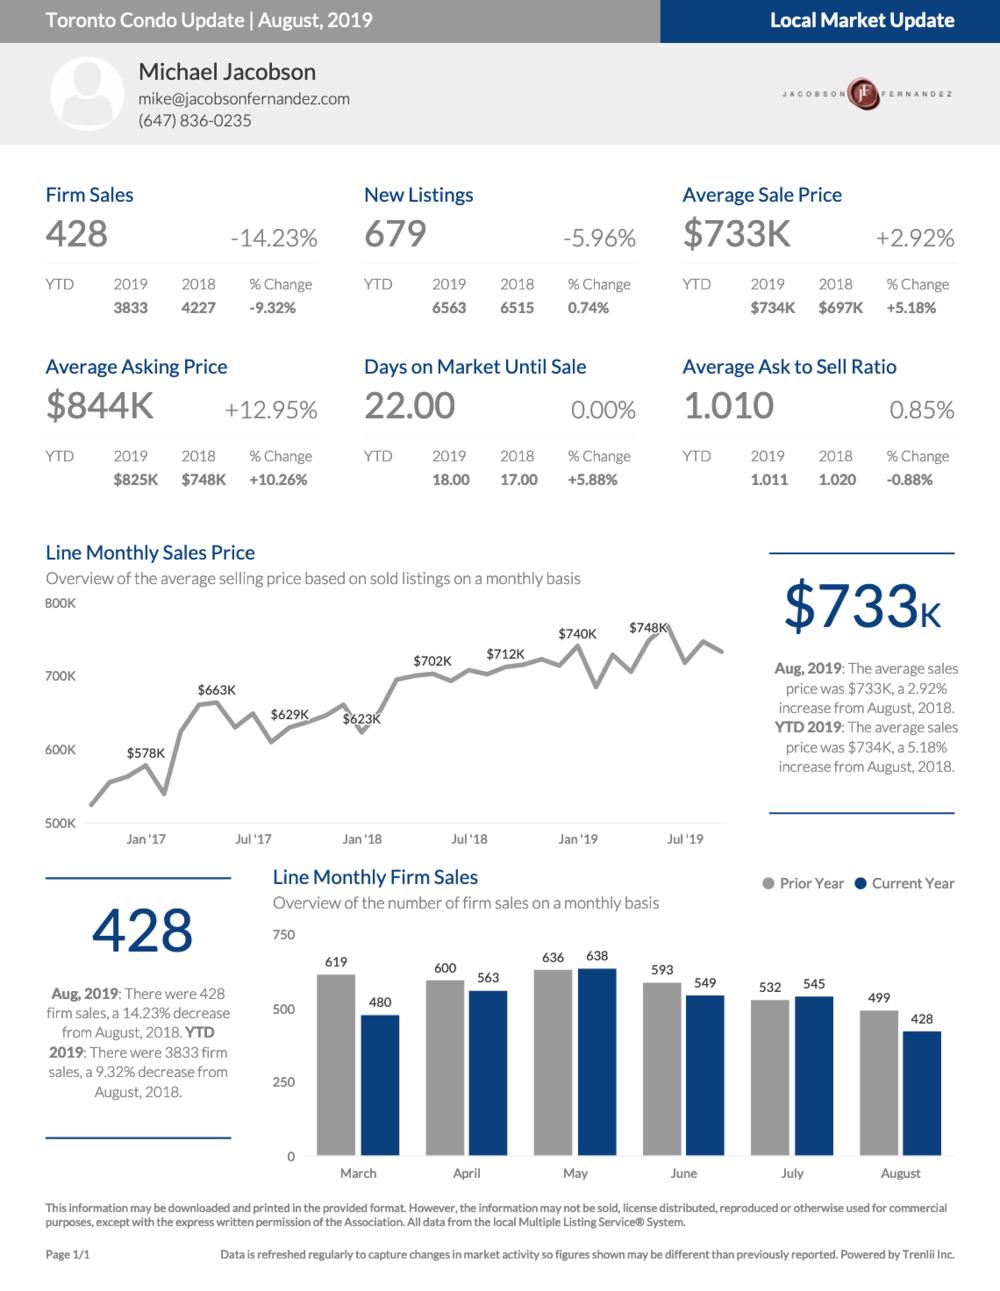 Toronto Condo Market Update for August Summary